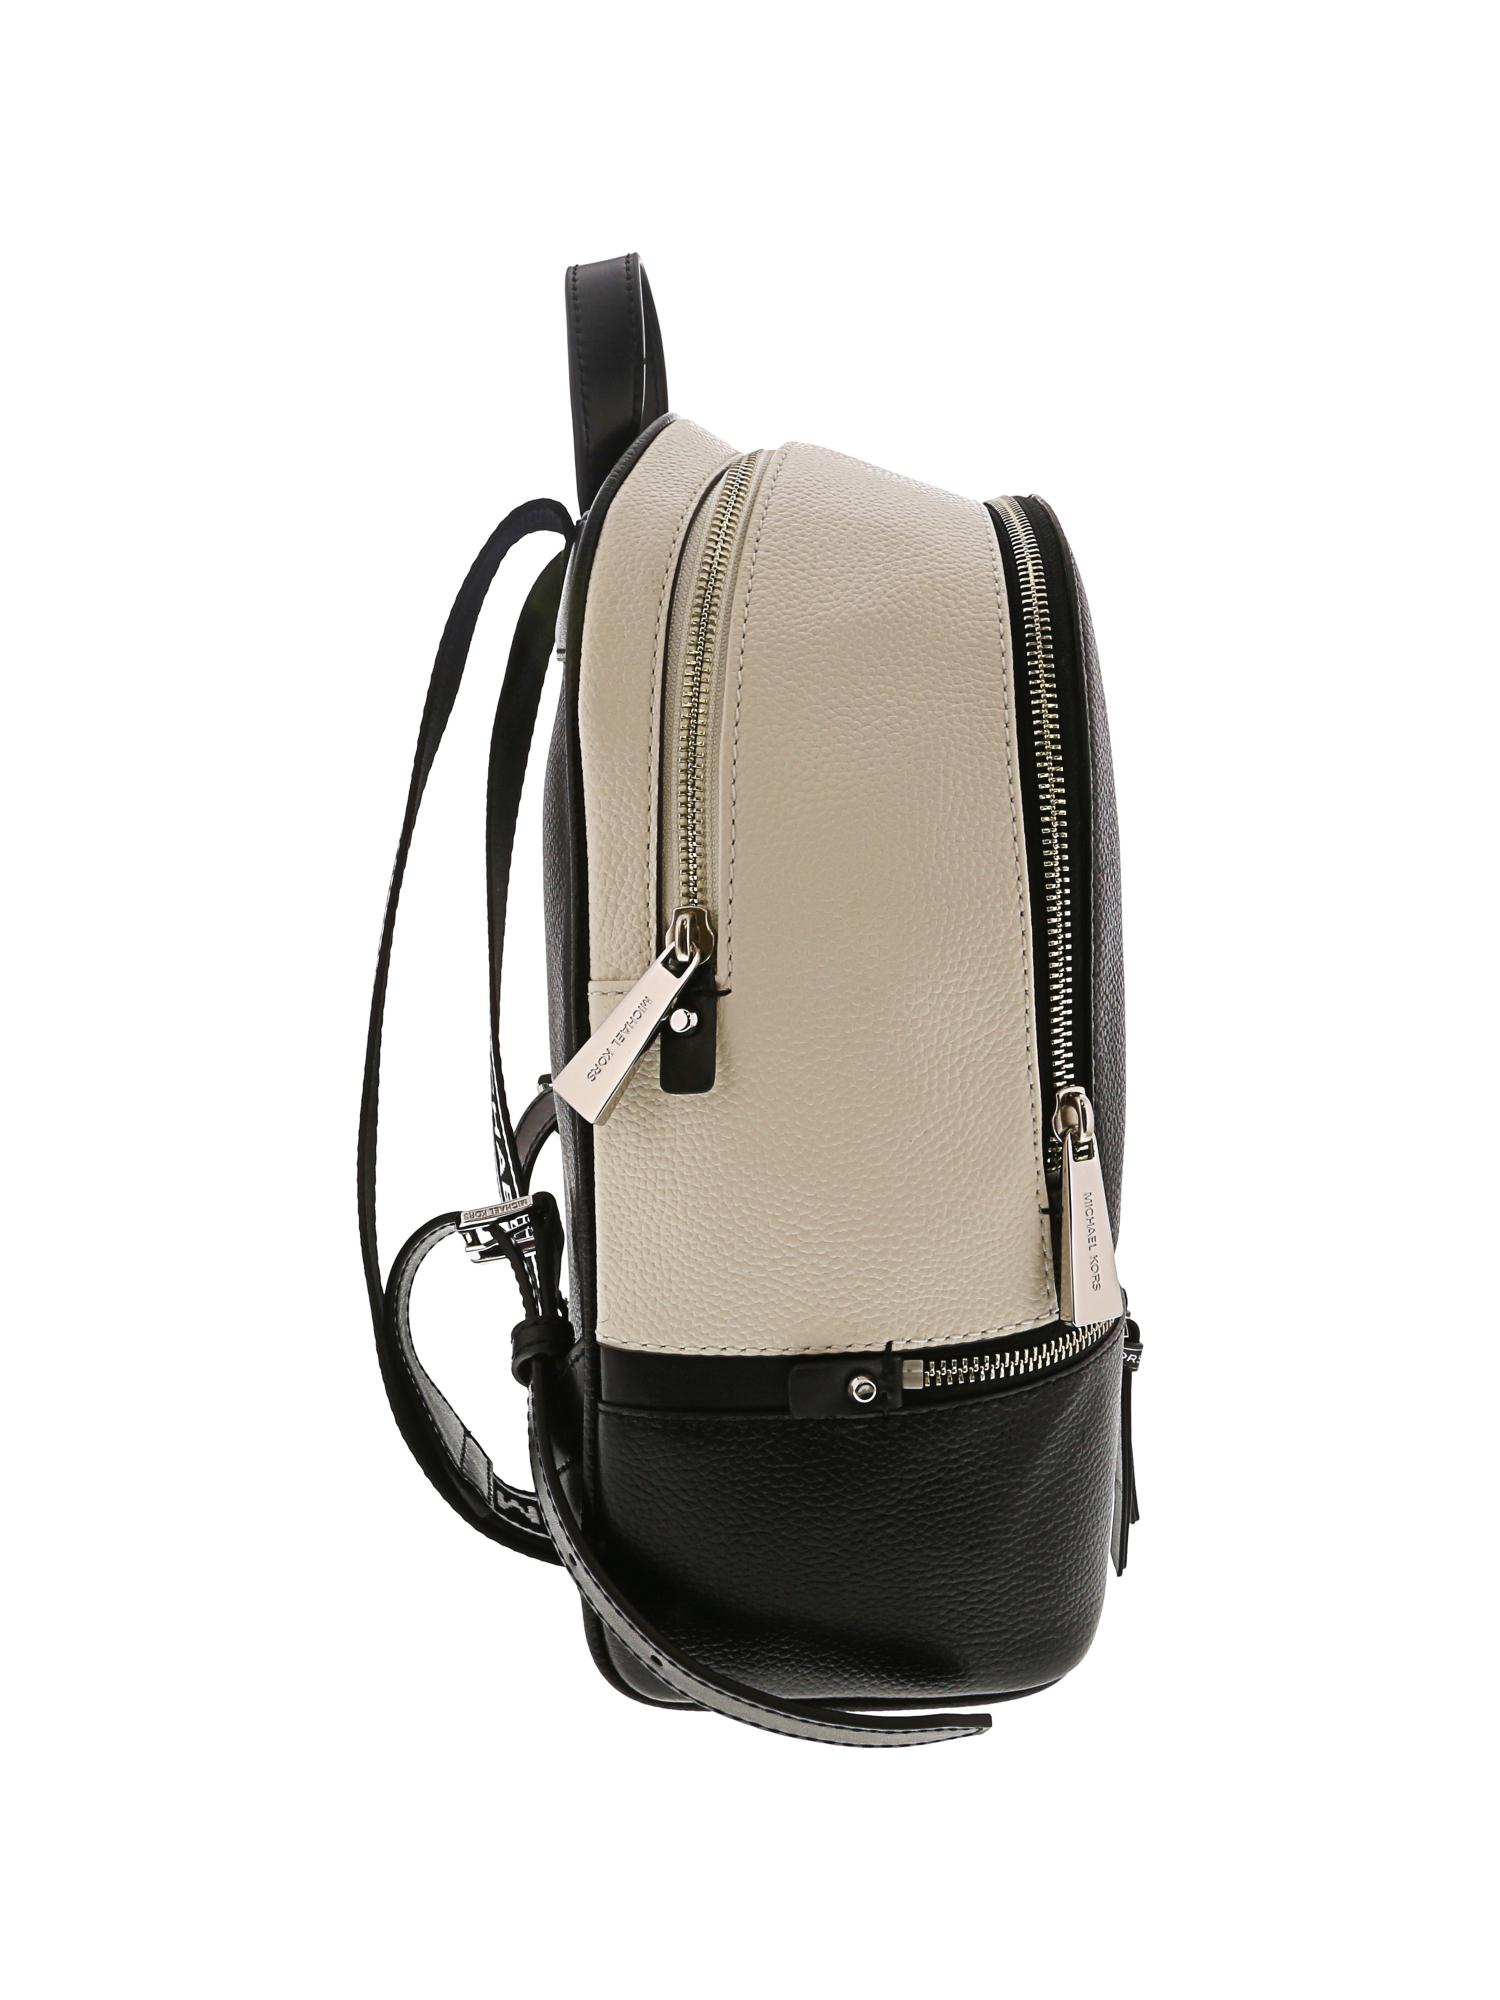 dee977b074c2 ... Picture 3 of 3. Michael Kors Women's Medium Rhea Logo Tape Leather  Backpack